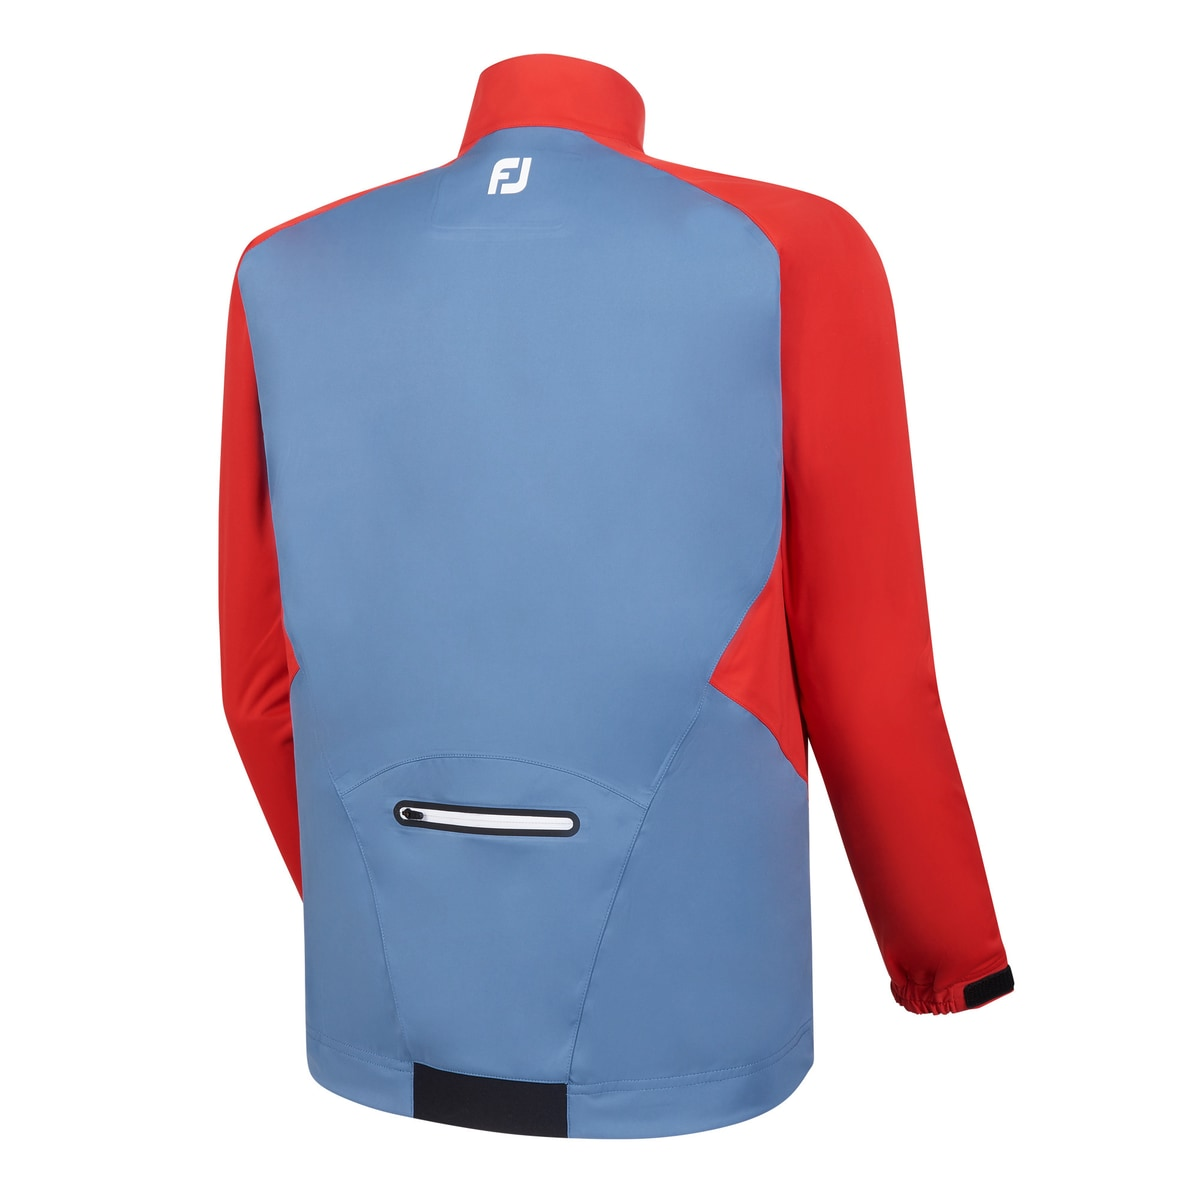 FJ Hydroknit Pullover-Previous Season Style